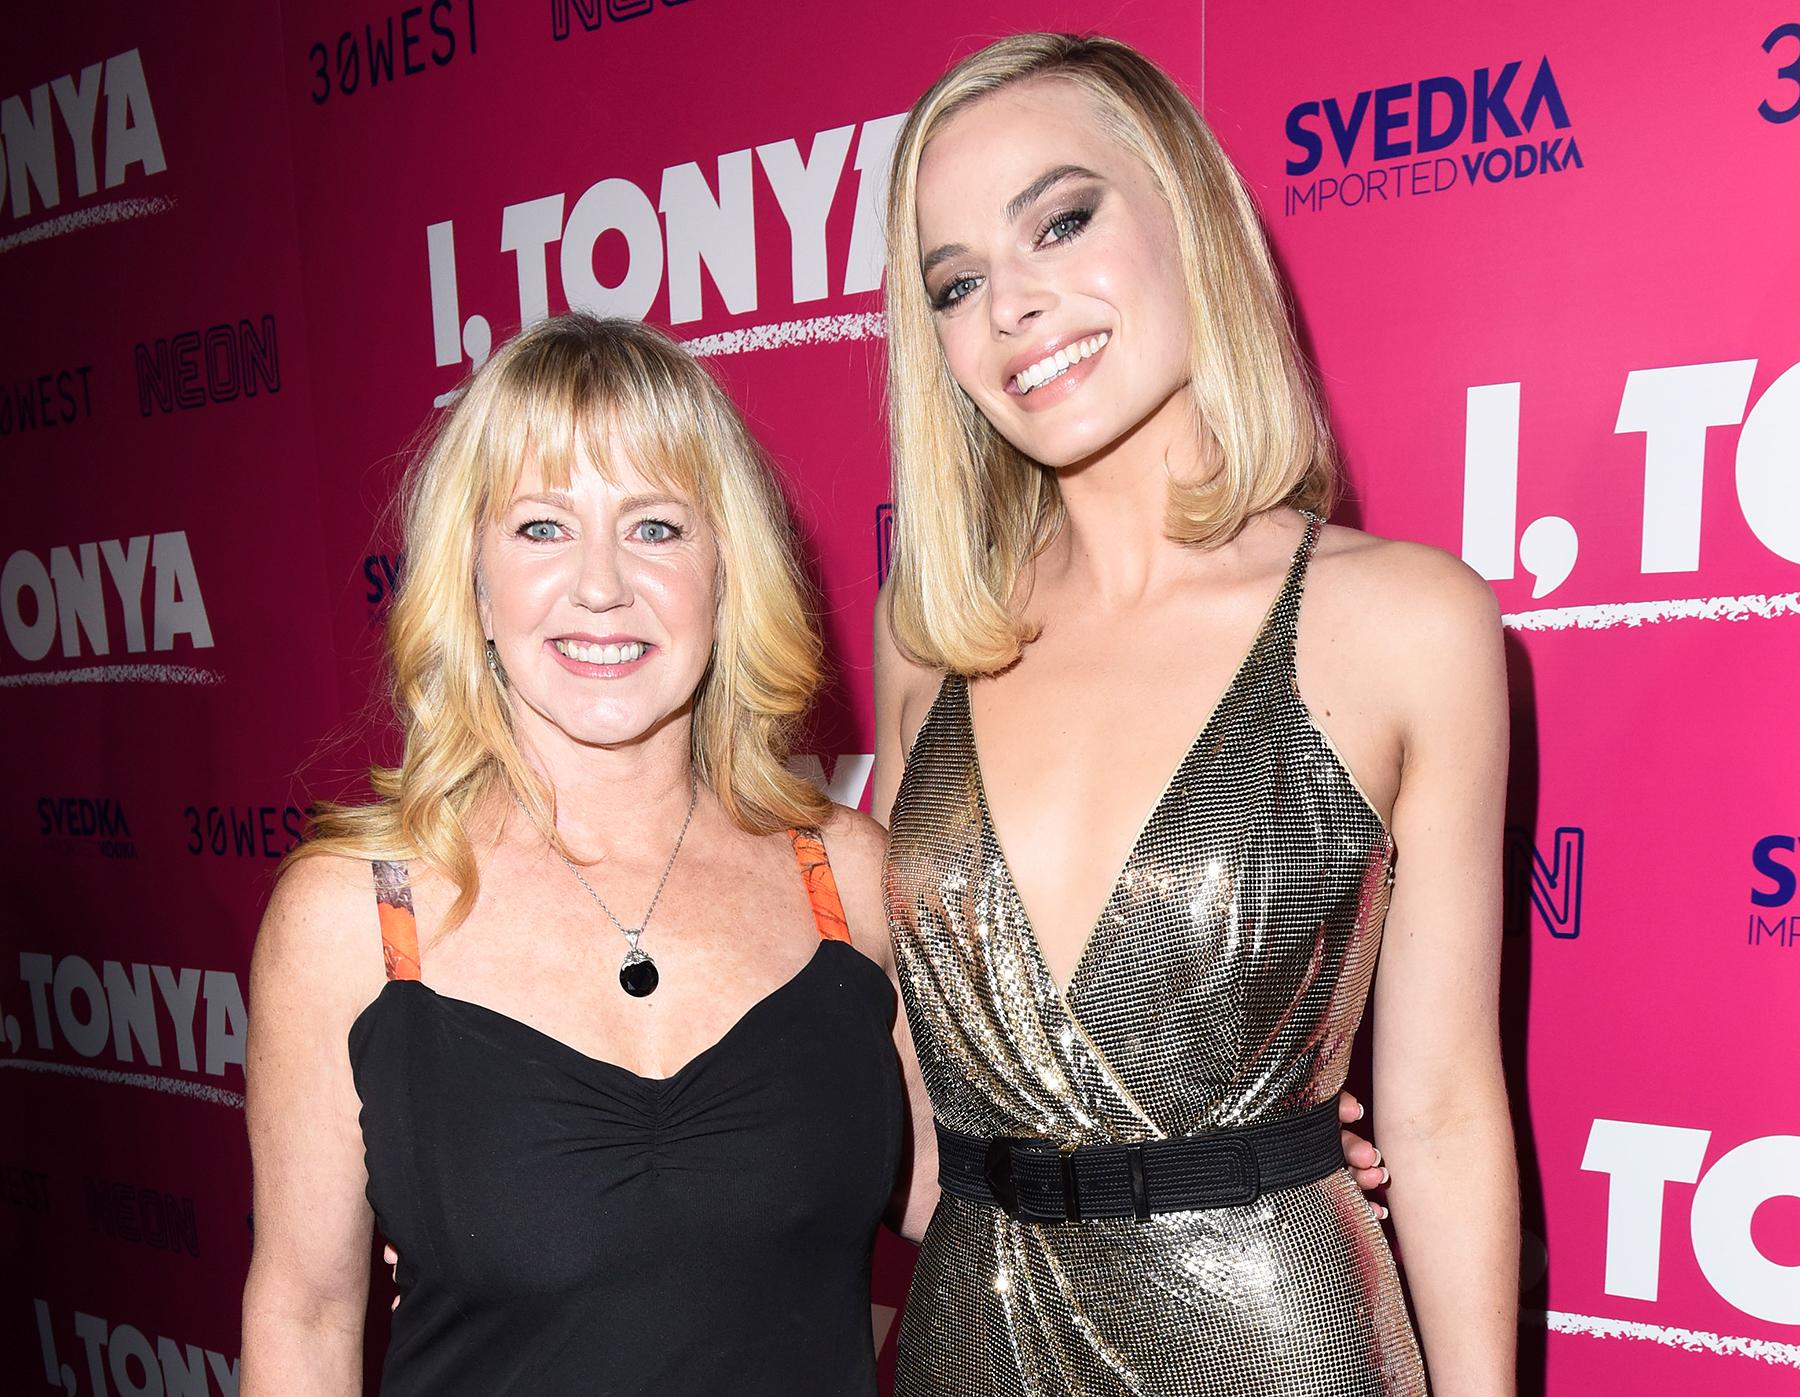 Tonya Harding Margot Robbie attend I, Tonya premiere